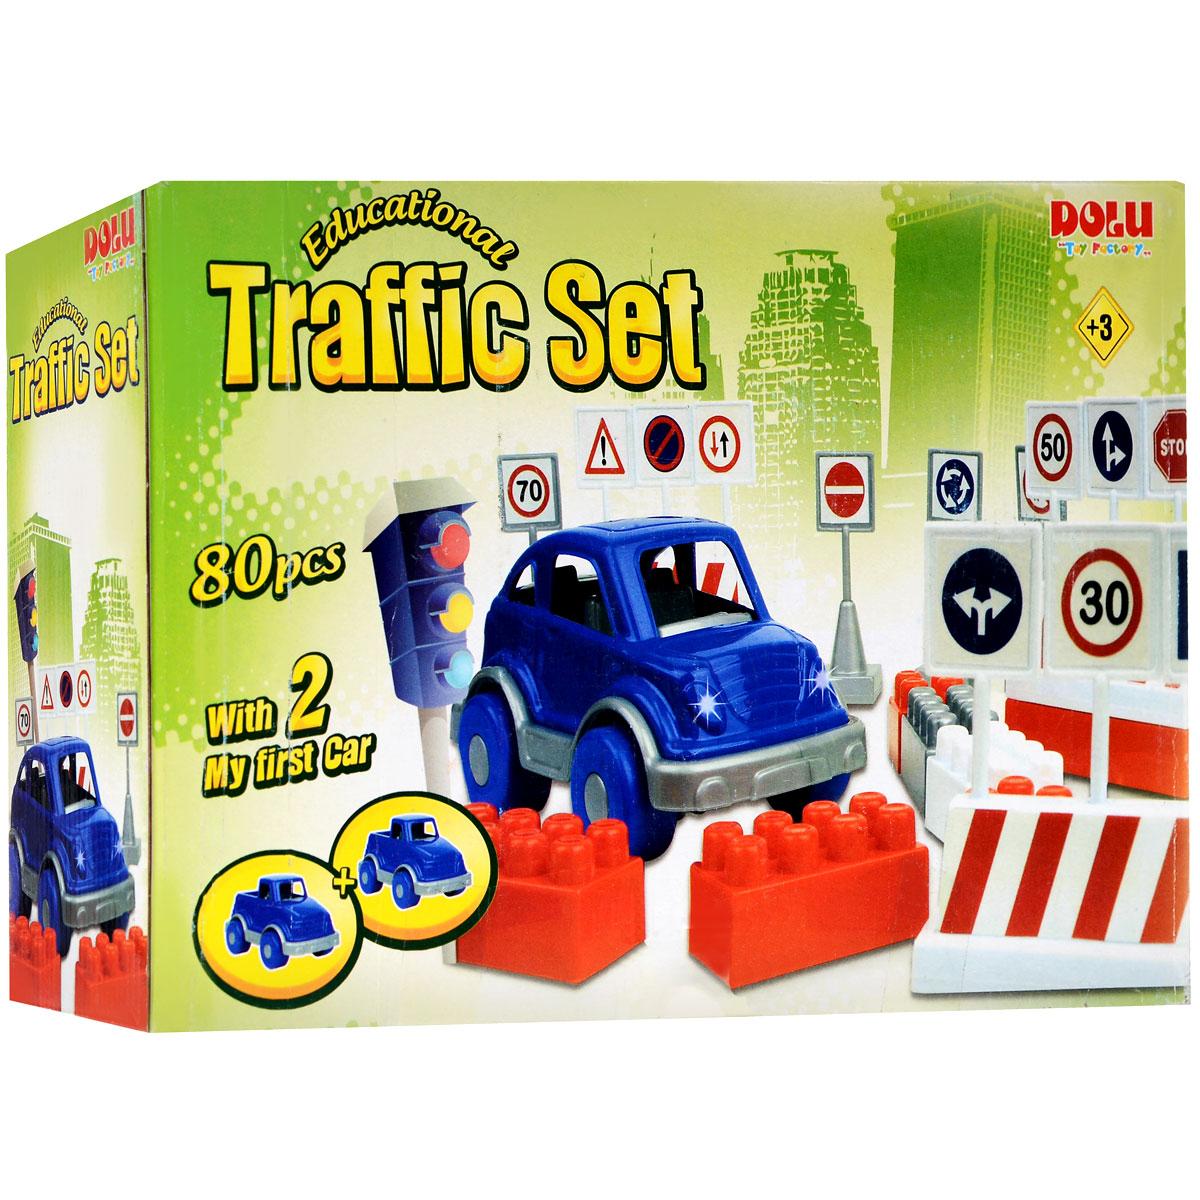 Dolu Конструктор Traffic Set обучающий dolu конструктор traffic set обучающий